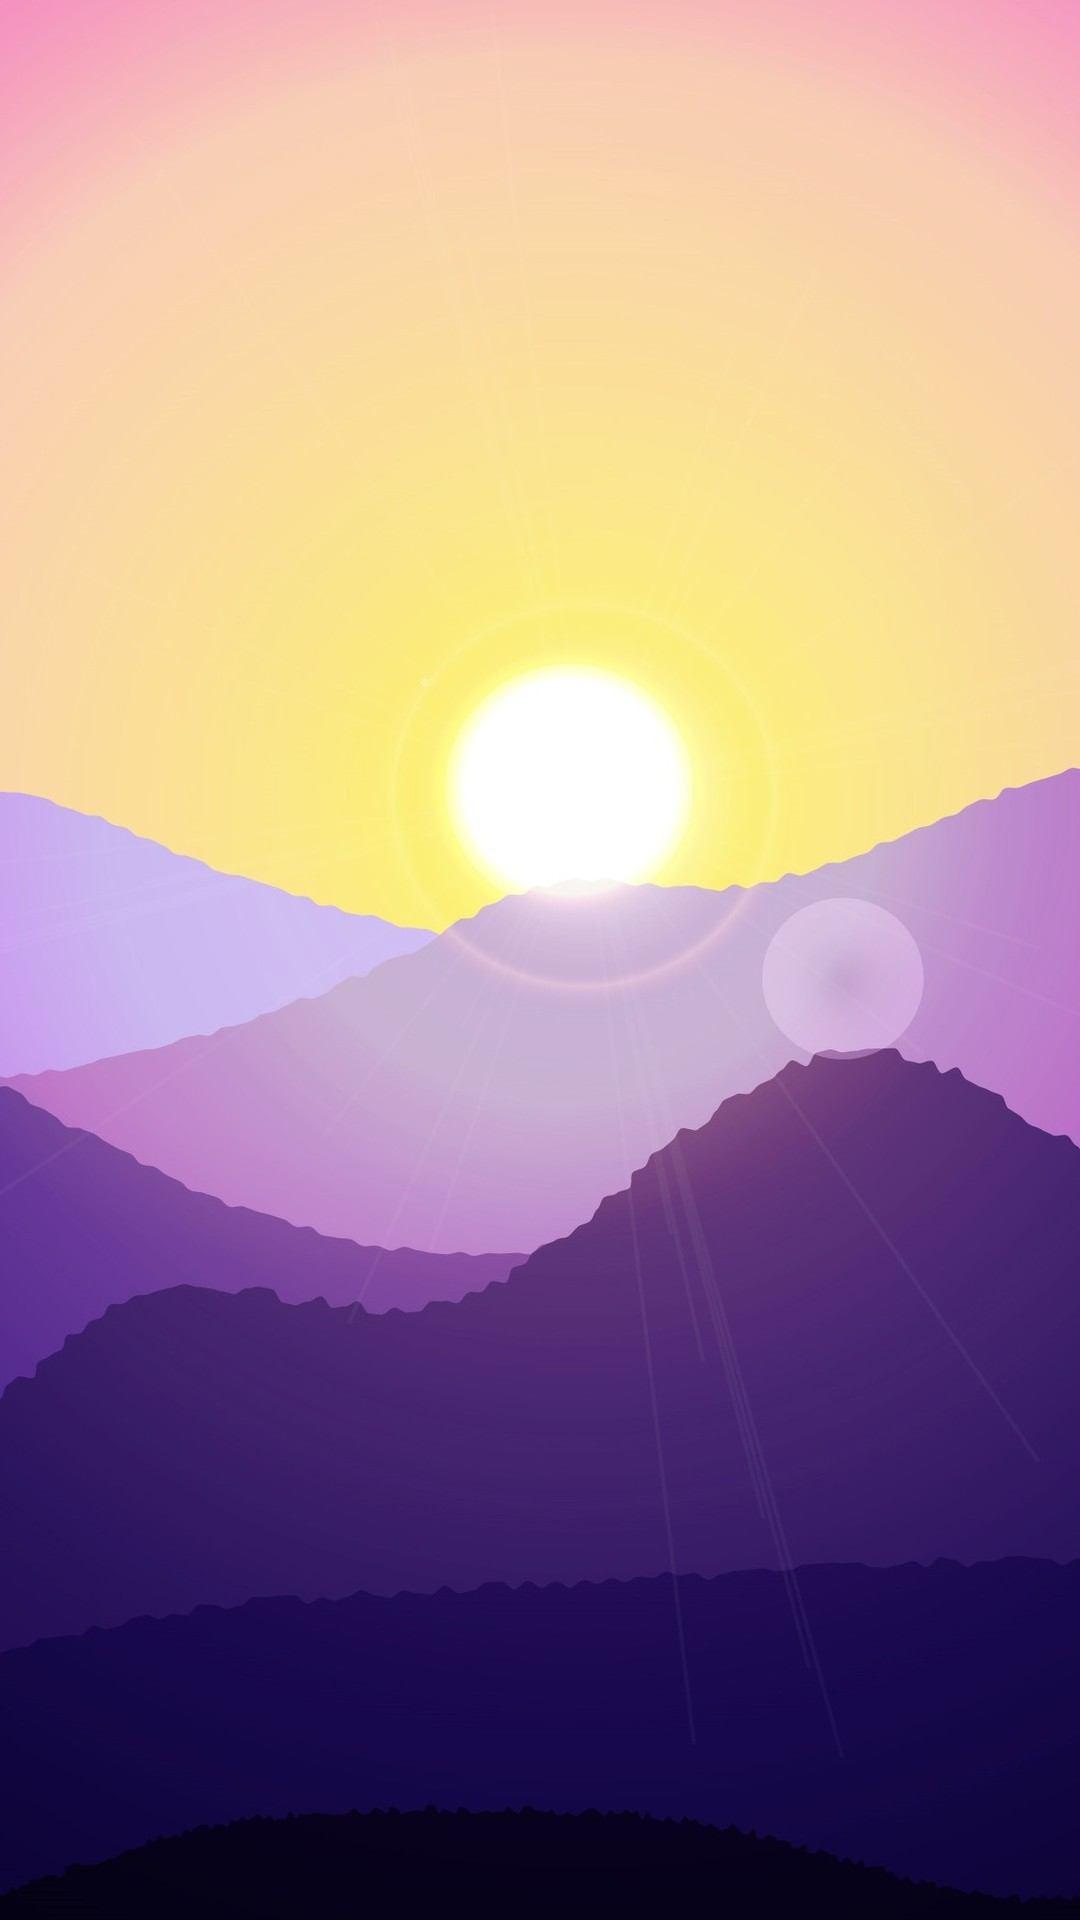 sunset mountain minimal art 4k yi 1080x1920 - Pack de Fondos de Pantalla de Montañas